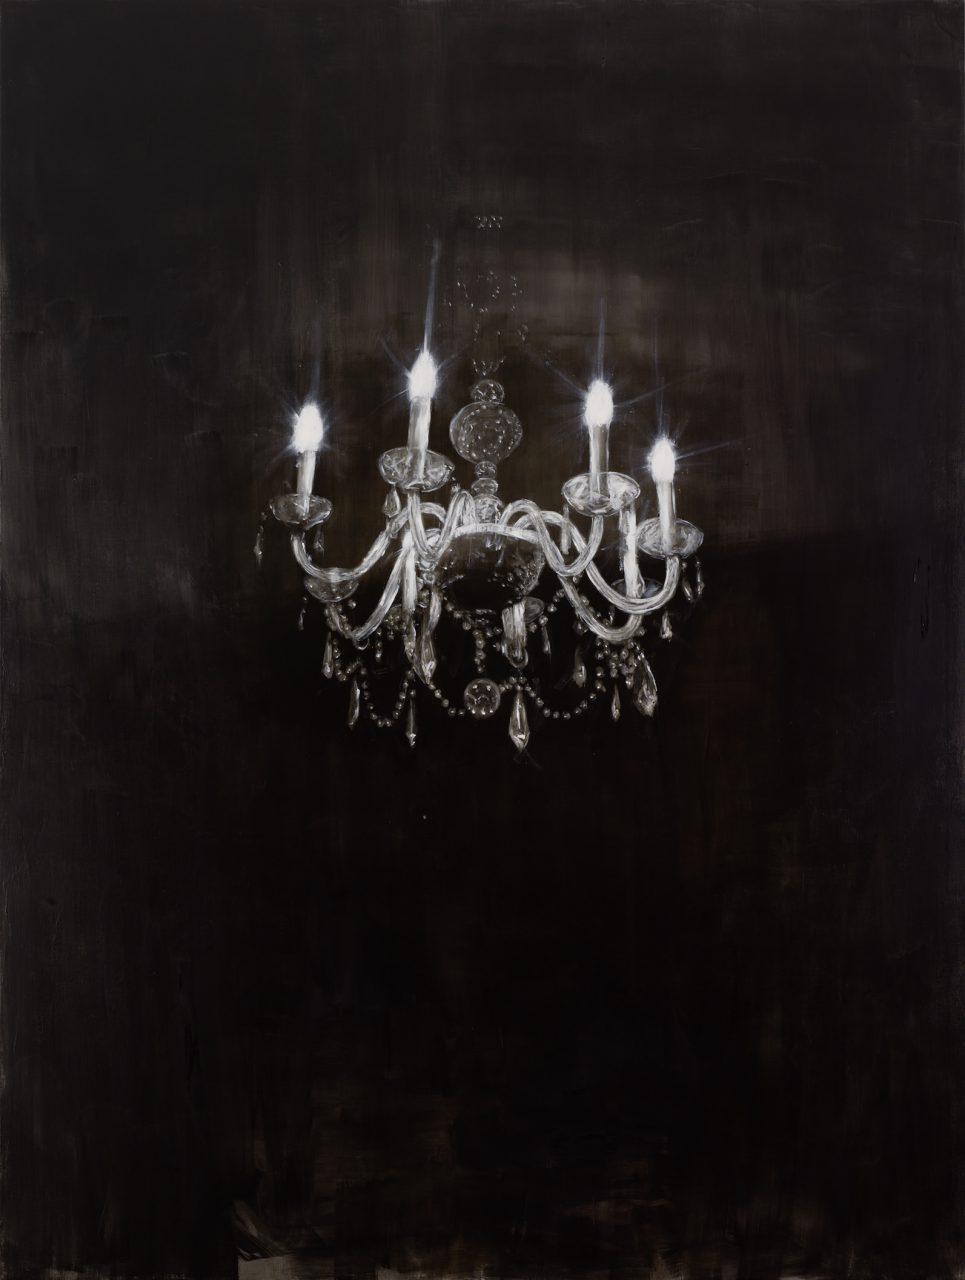 Chandelier 2 | 2013 | Öl auf Leinwand | 240 x 180cm